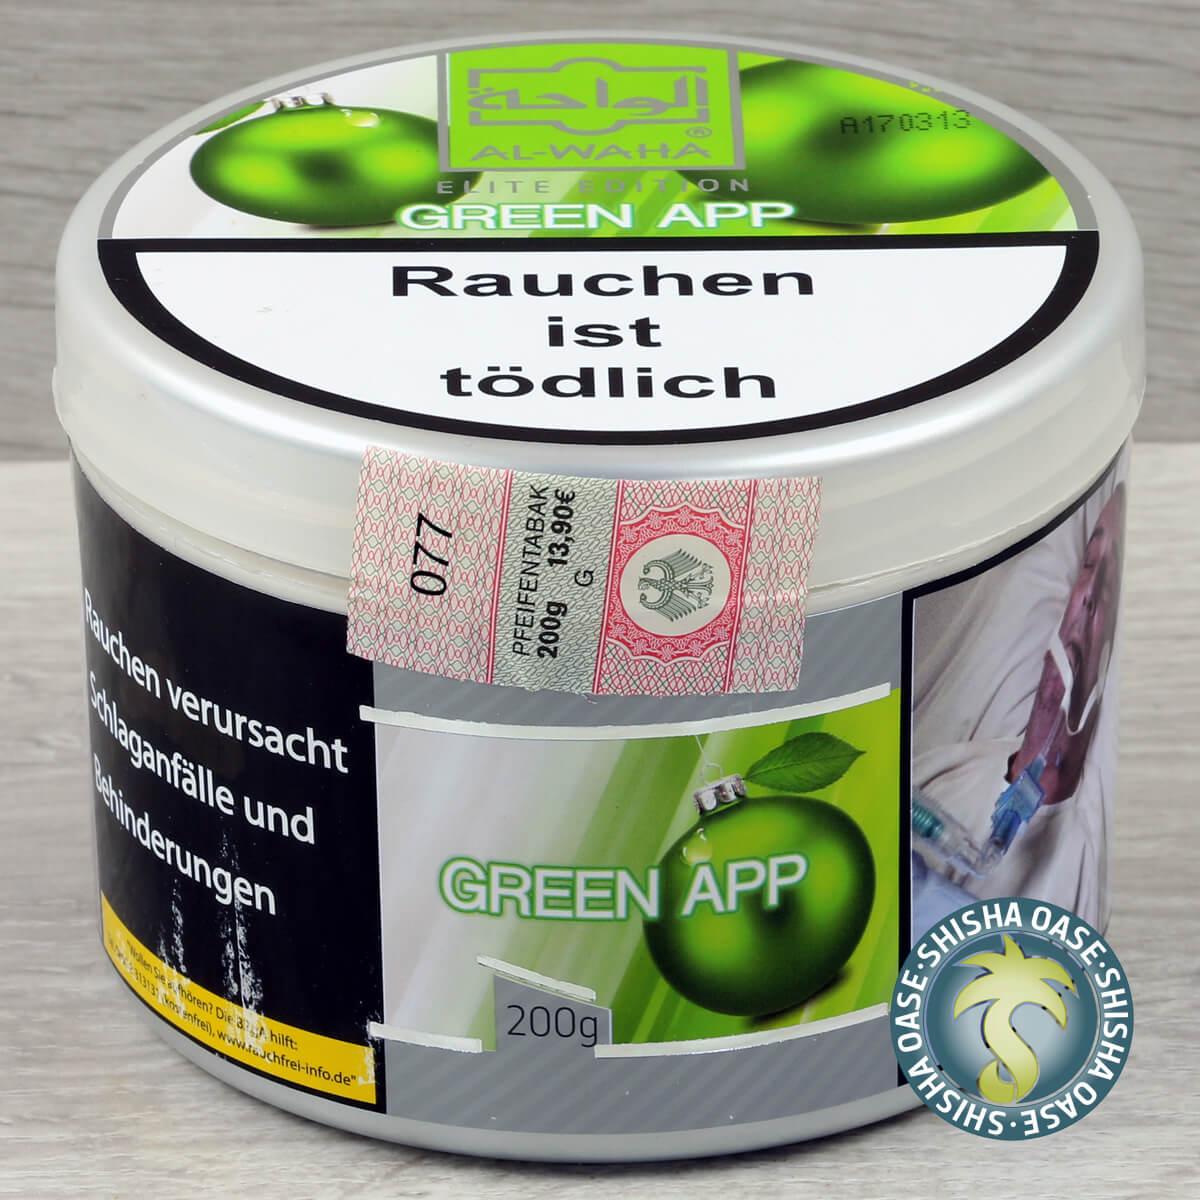 Al Waha Green App 200g Dose - rauchfertig